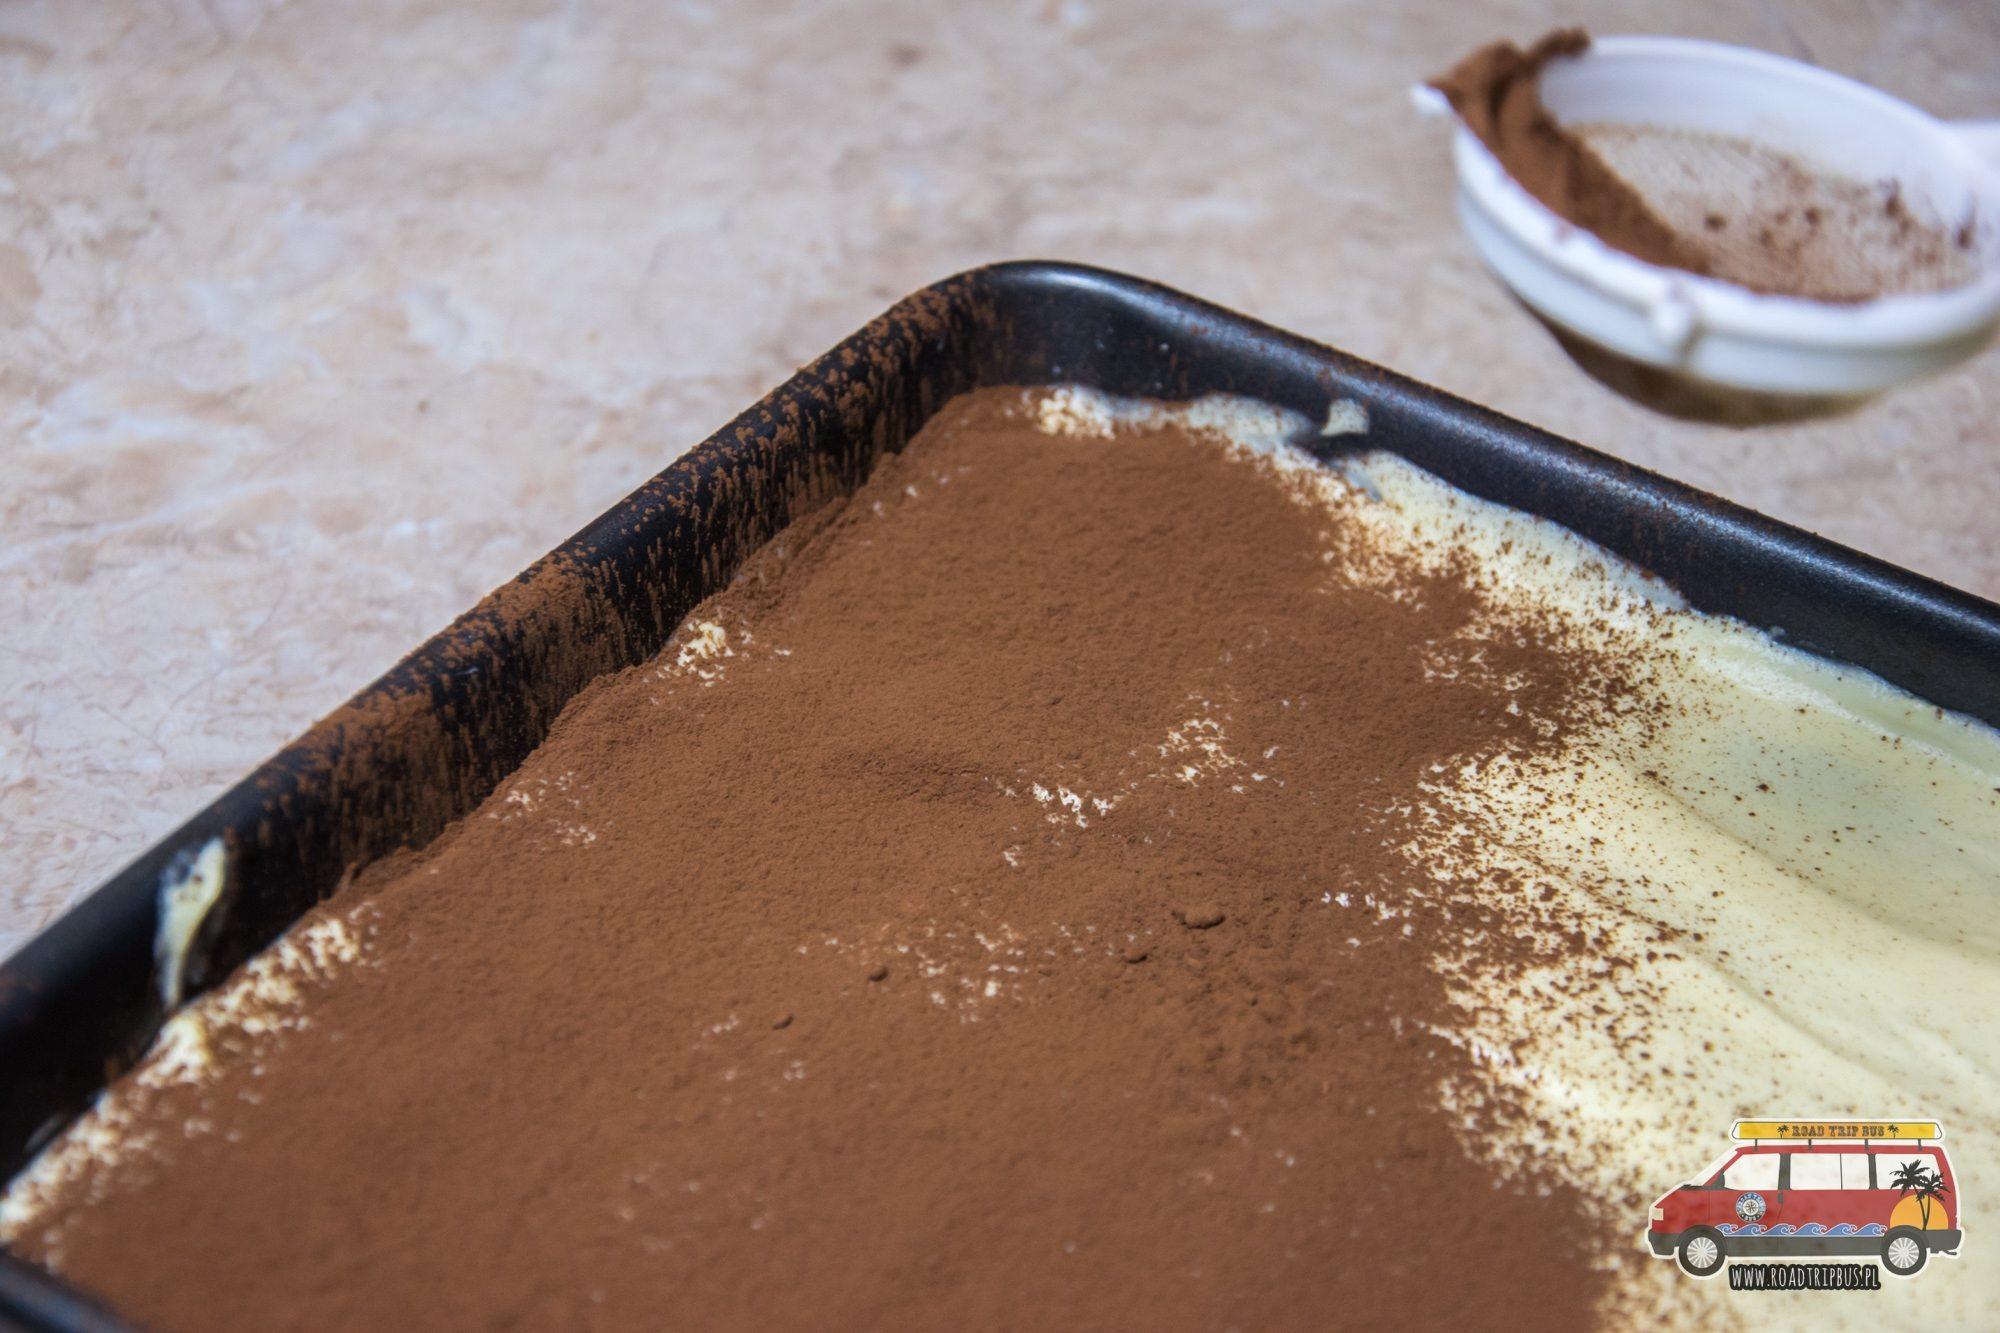 posypywanie tiramisu kakaem